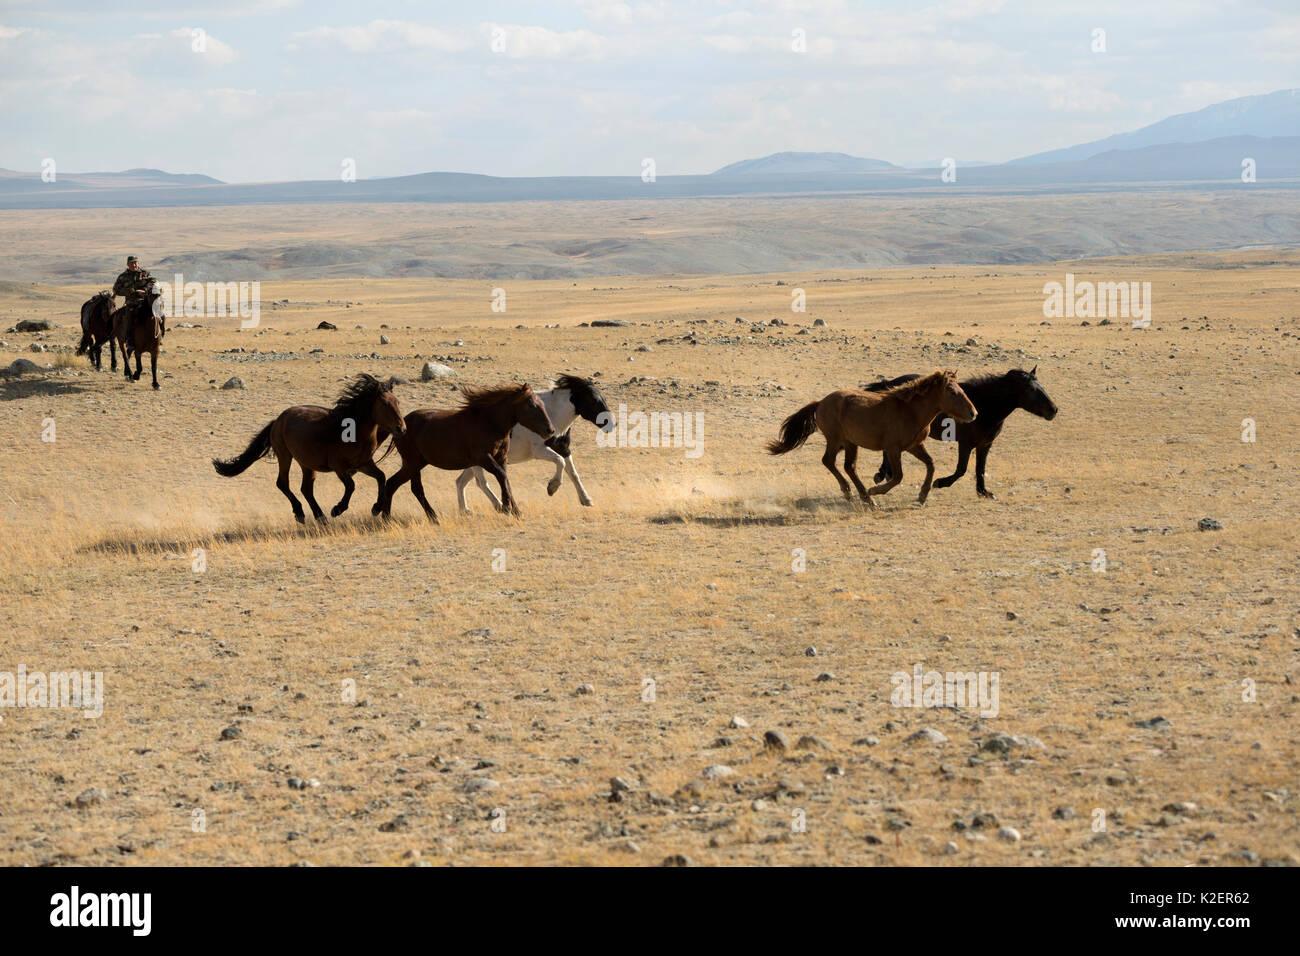 Horse breeder gathering band of wild Mongolian horses, plains at the foot of Dungurukh Uul mountain, near the border with China and Kazakhstan, Bayan-Olgiy aymag, Mongolia. September. - Stock Image